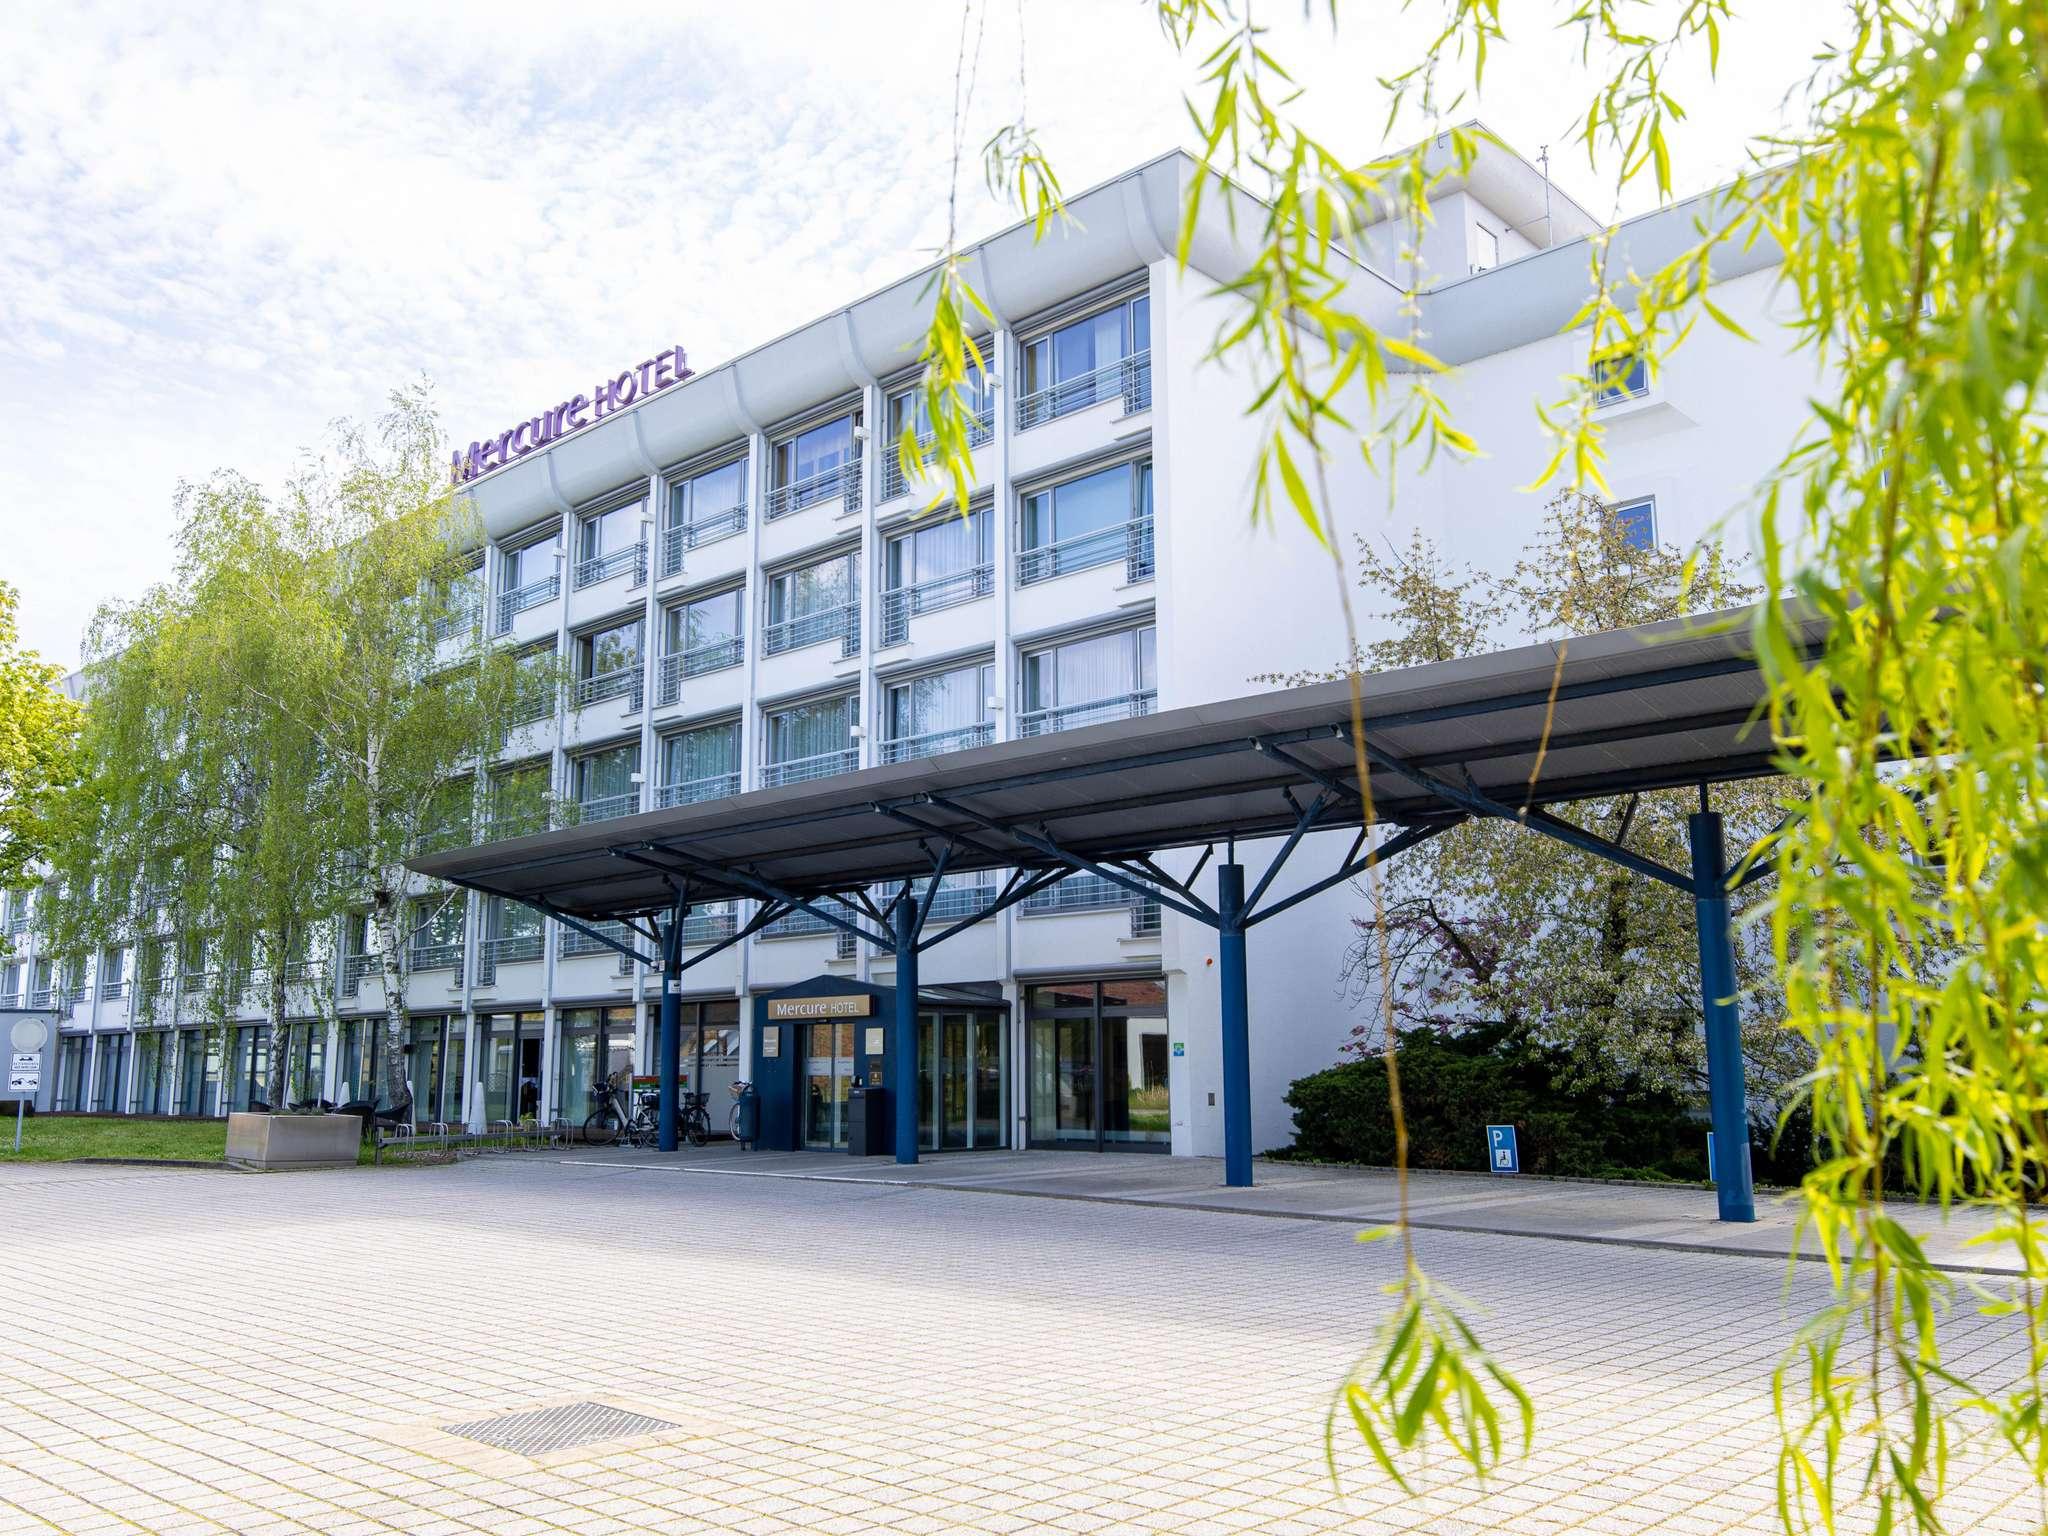 4 Sterne Hotel Riesa Dresden Elbland Mercure